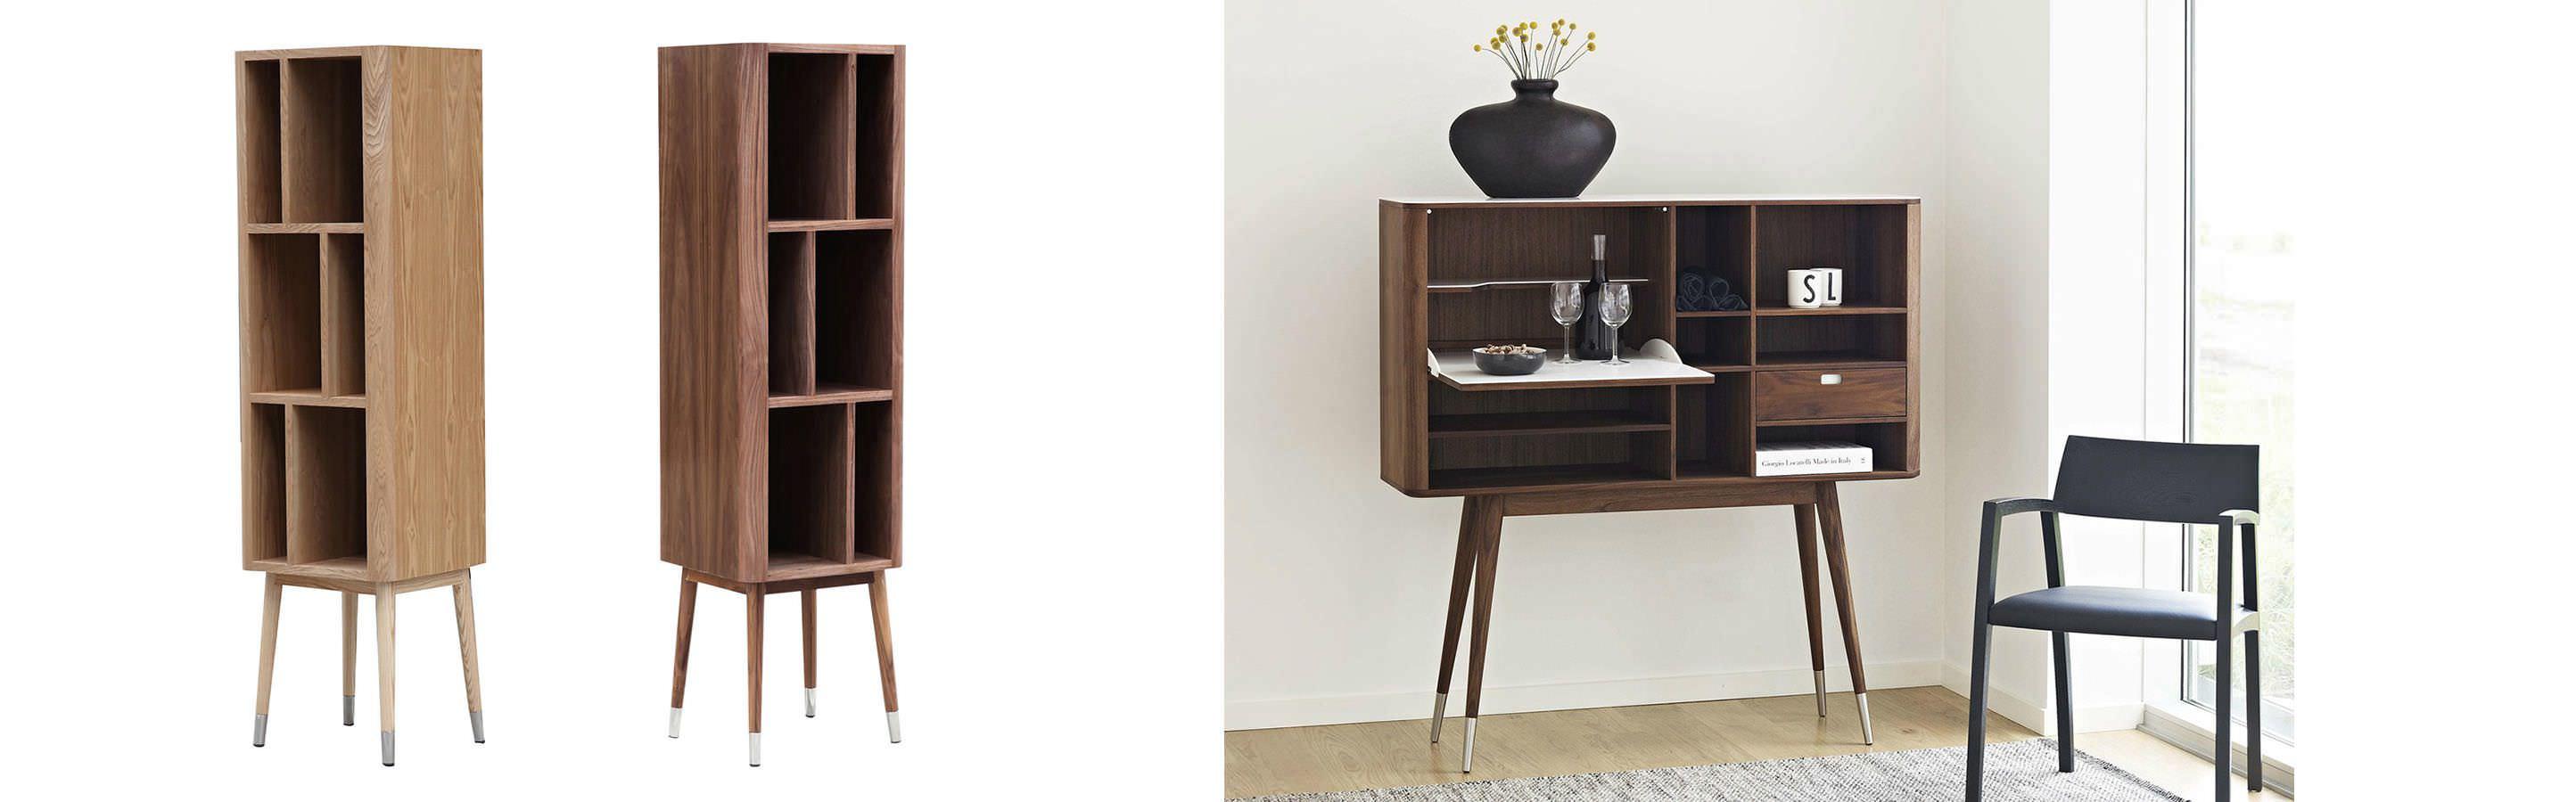 AK2750 Mid Century Modern Cabinet